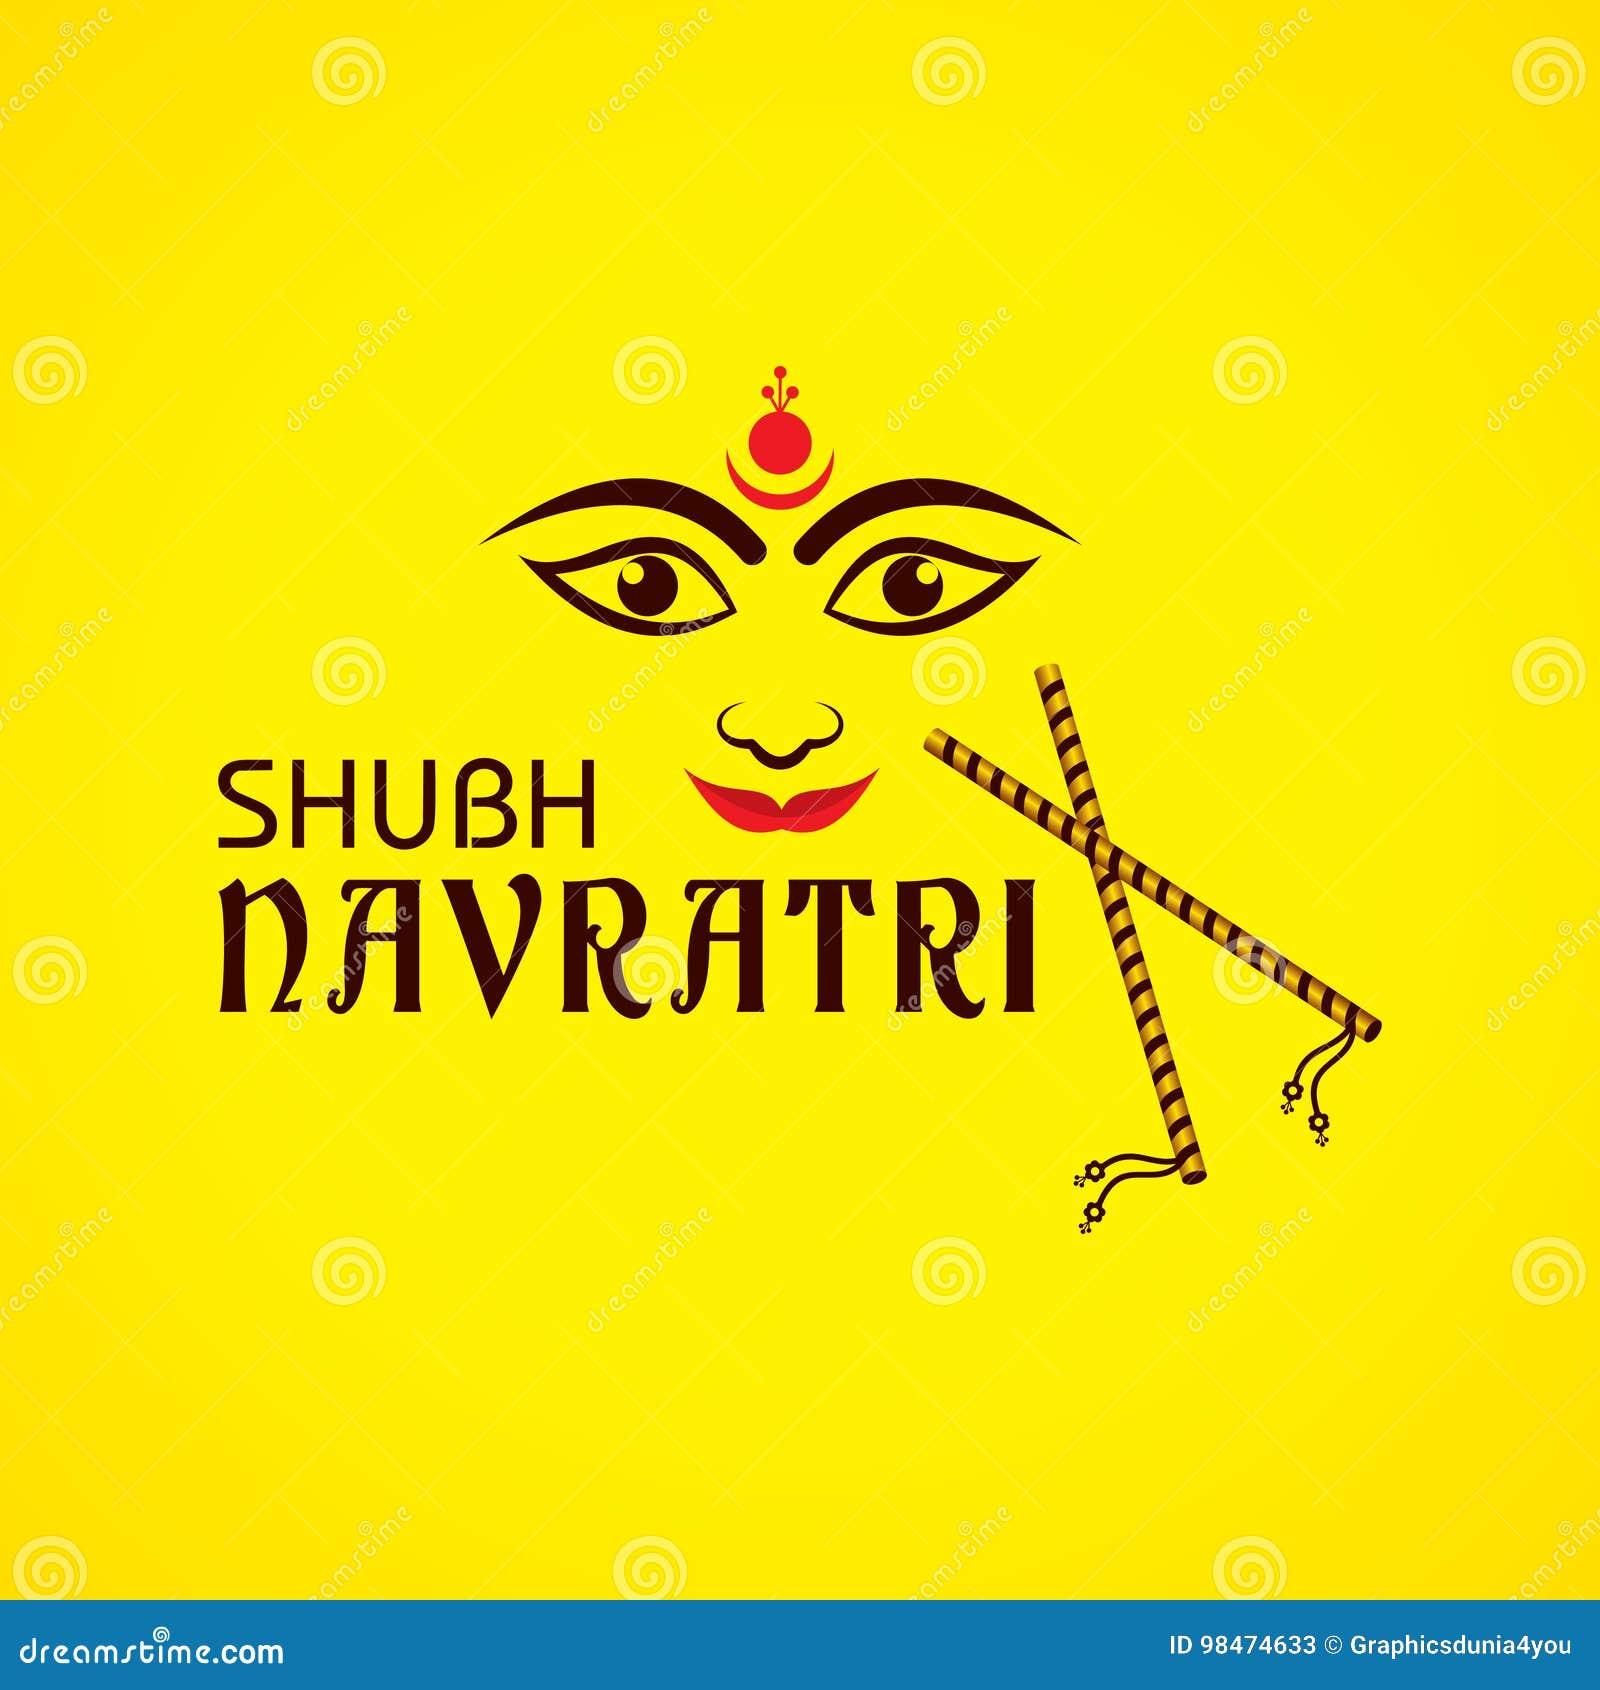 Navratri utsav greeting card stock vector illustration of diwali navratri utsav greeting card diwali holy kristyandbryce Choice Image